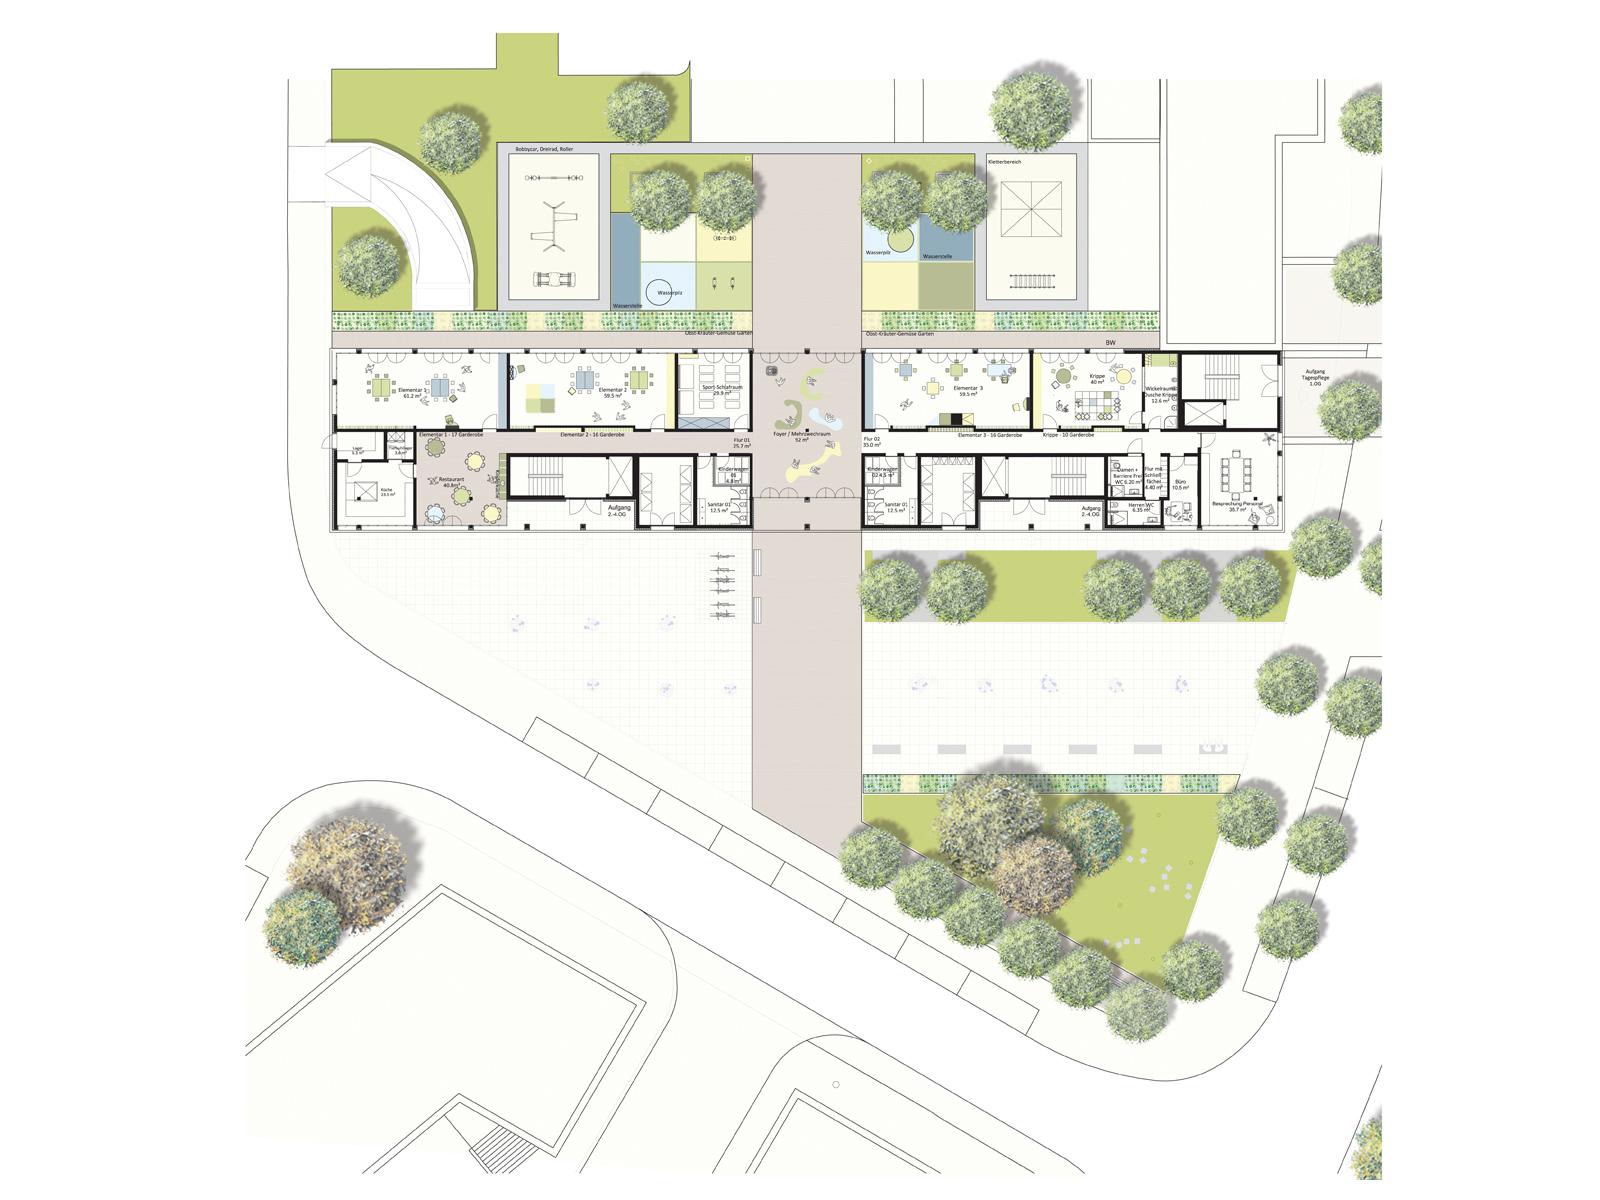 New Apartment Block And Townhouses In Erfurt Bruhl Sud Design